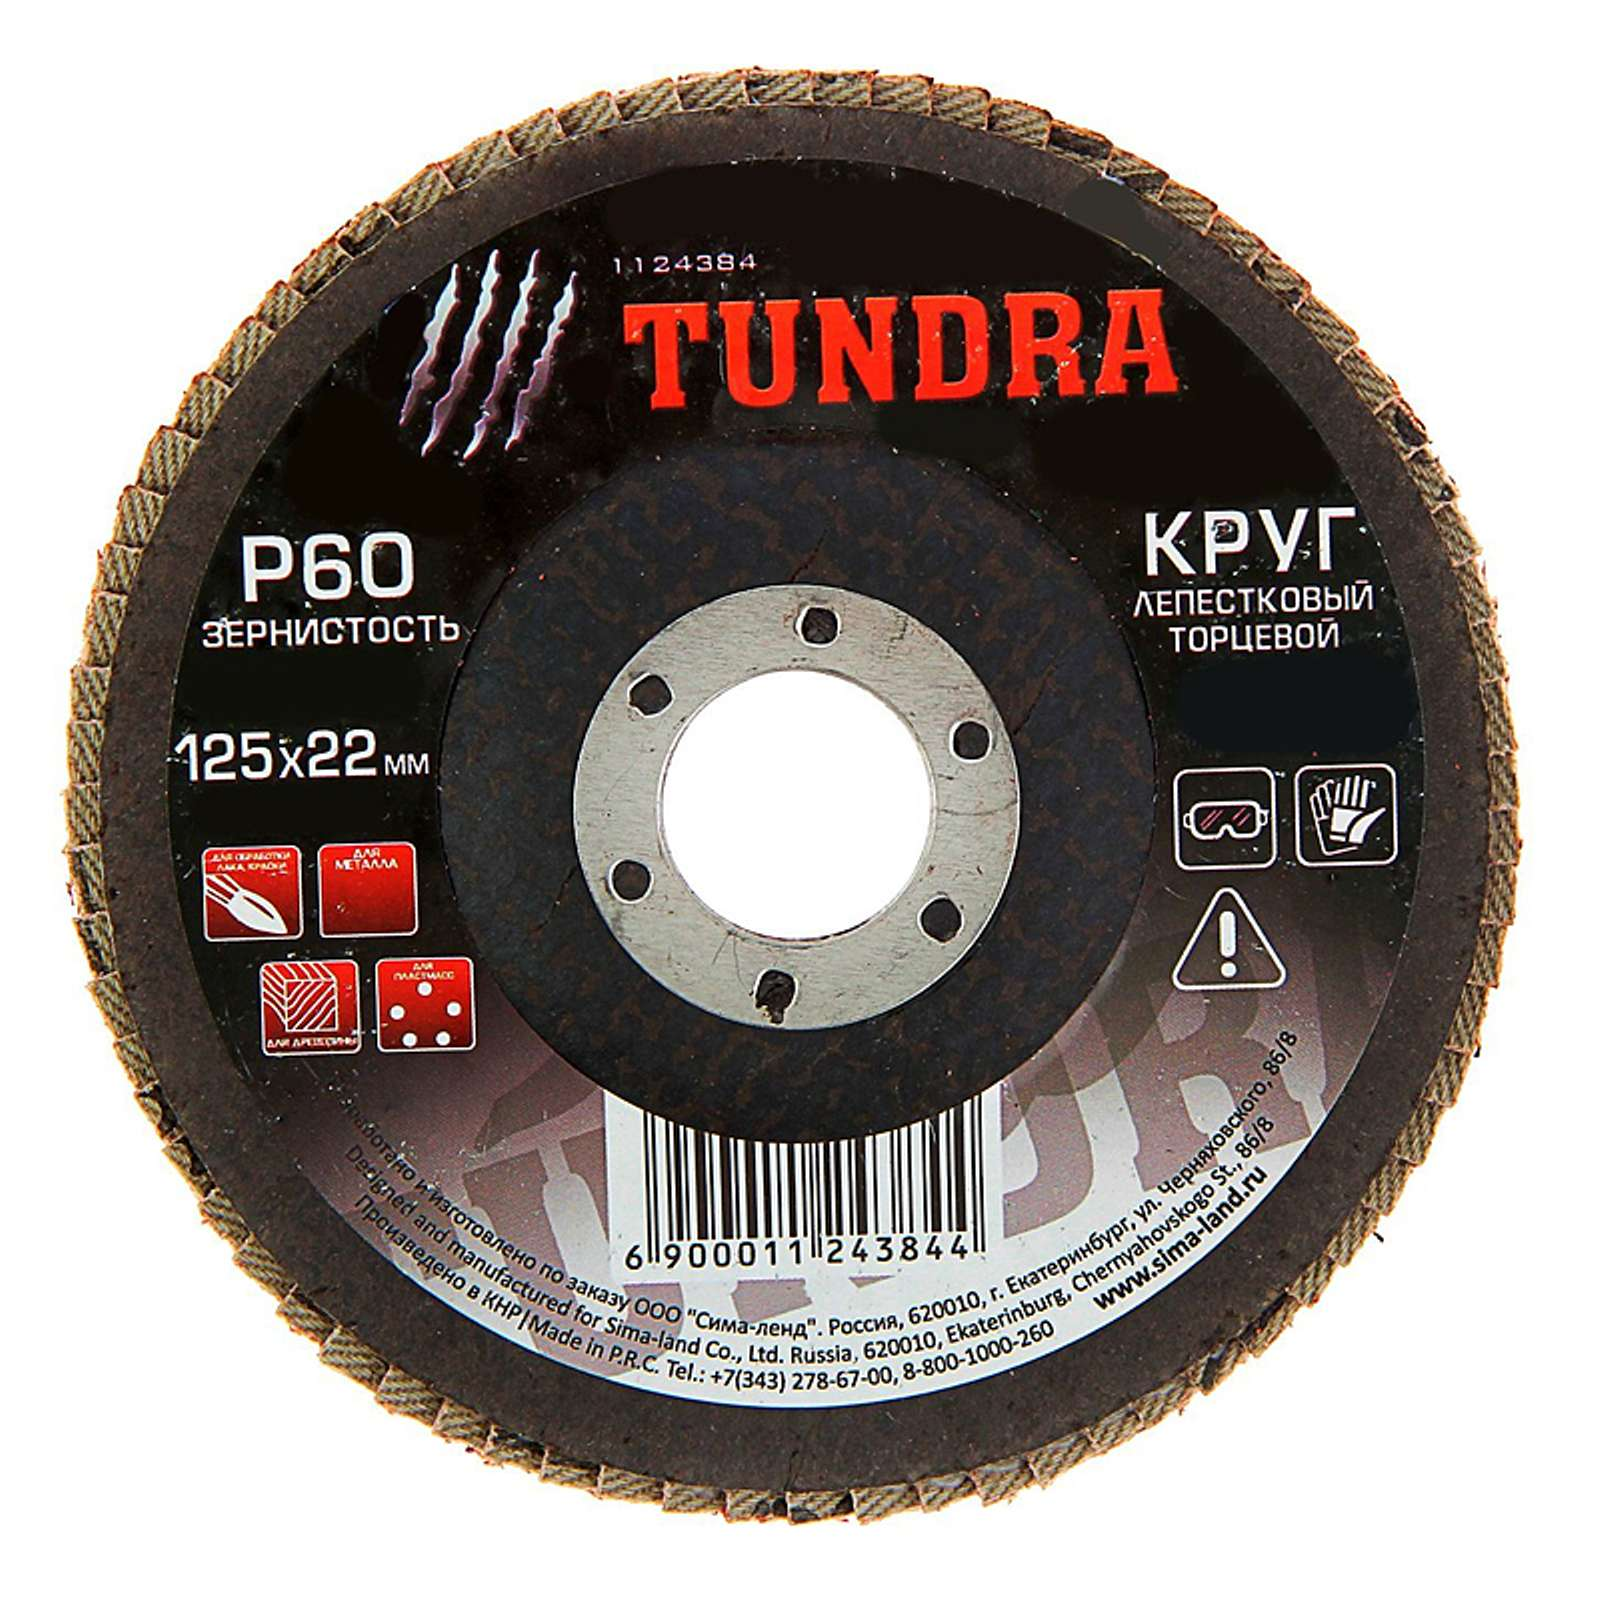 "Круг лепестковый торцевой ""TUNDRA"" 125х22 мм, Р60"